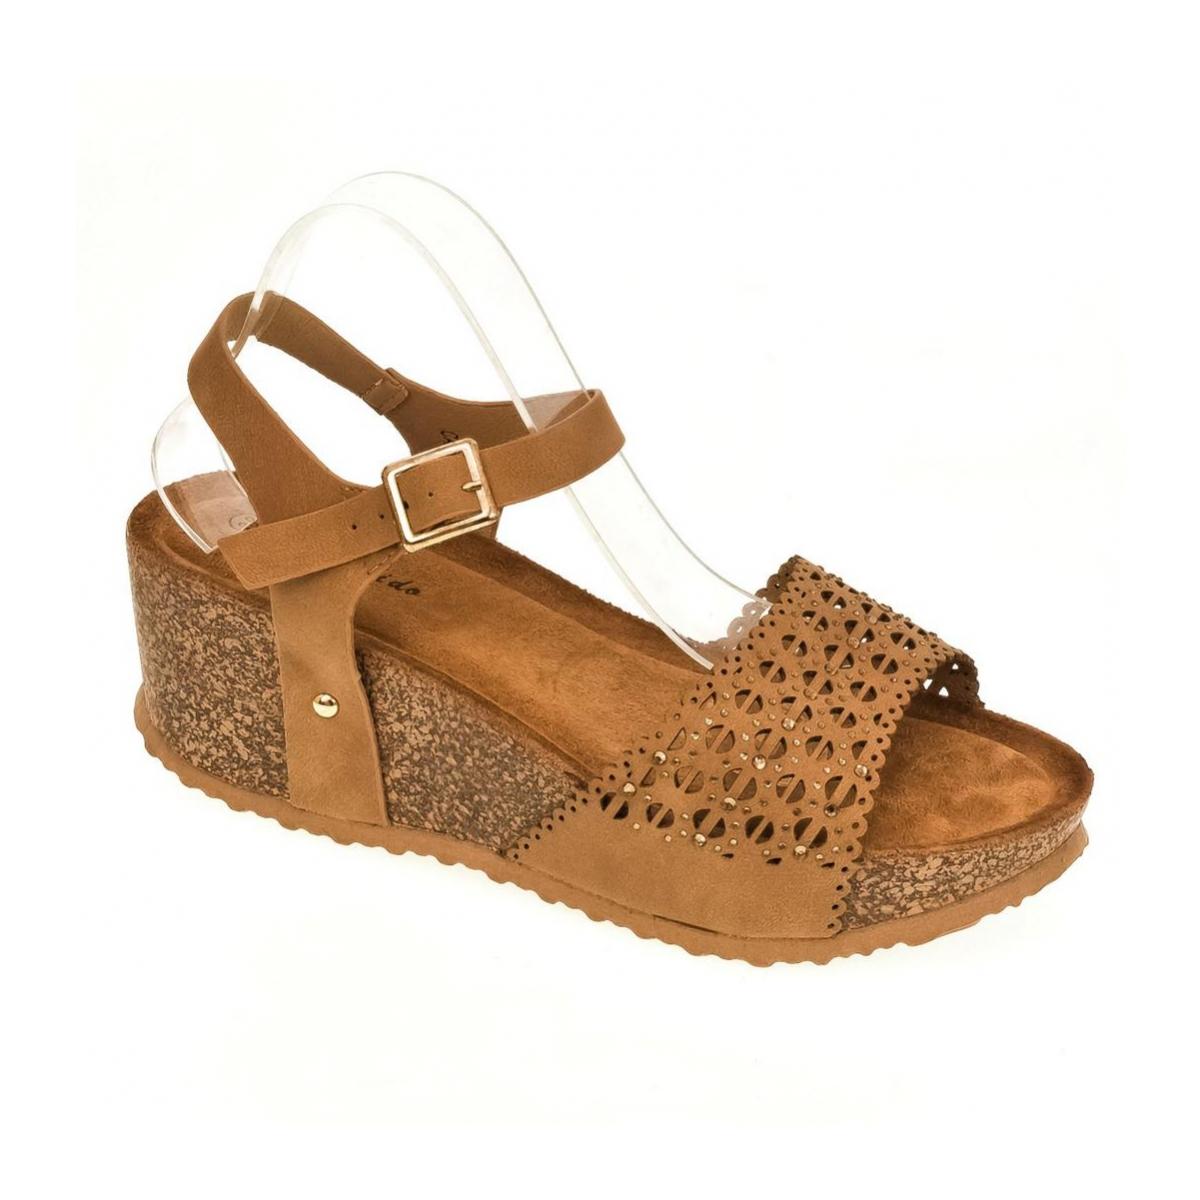 58381764cc Dámske hnedé sandále SHARI - 4